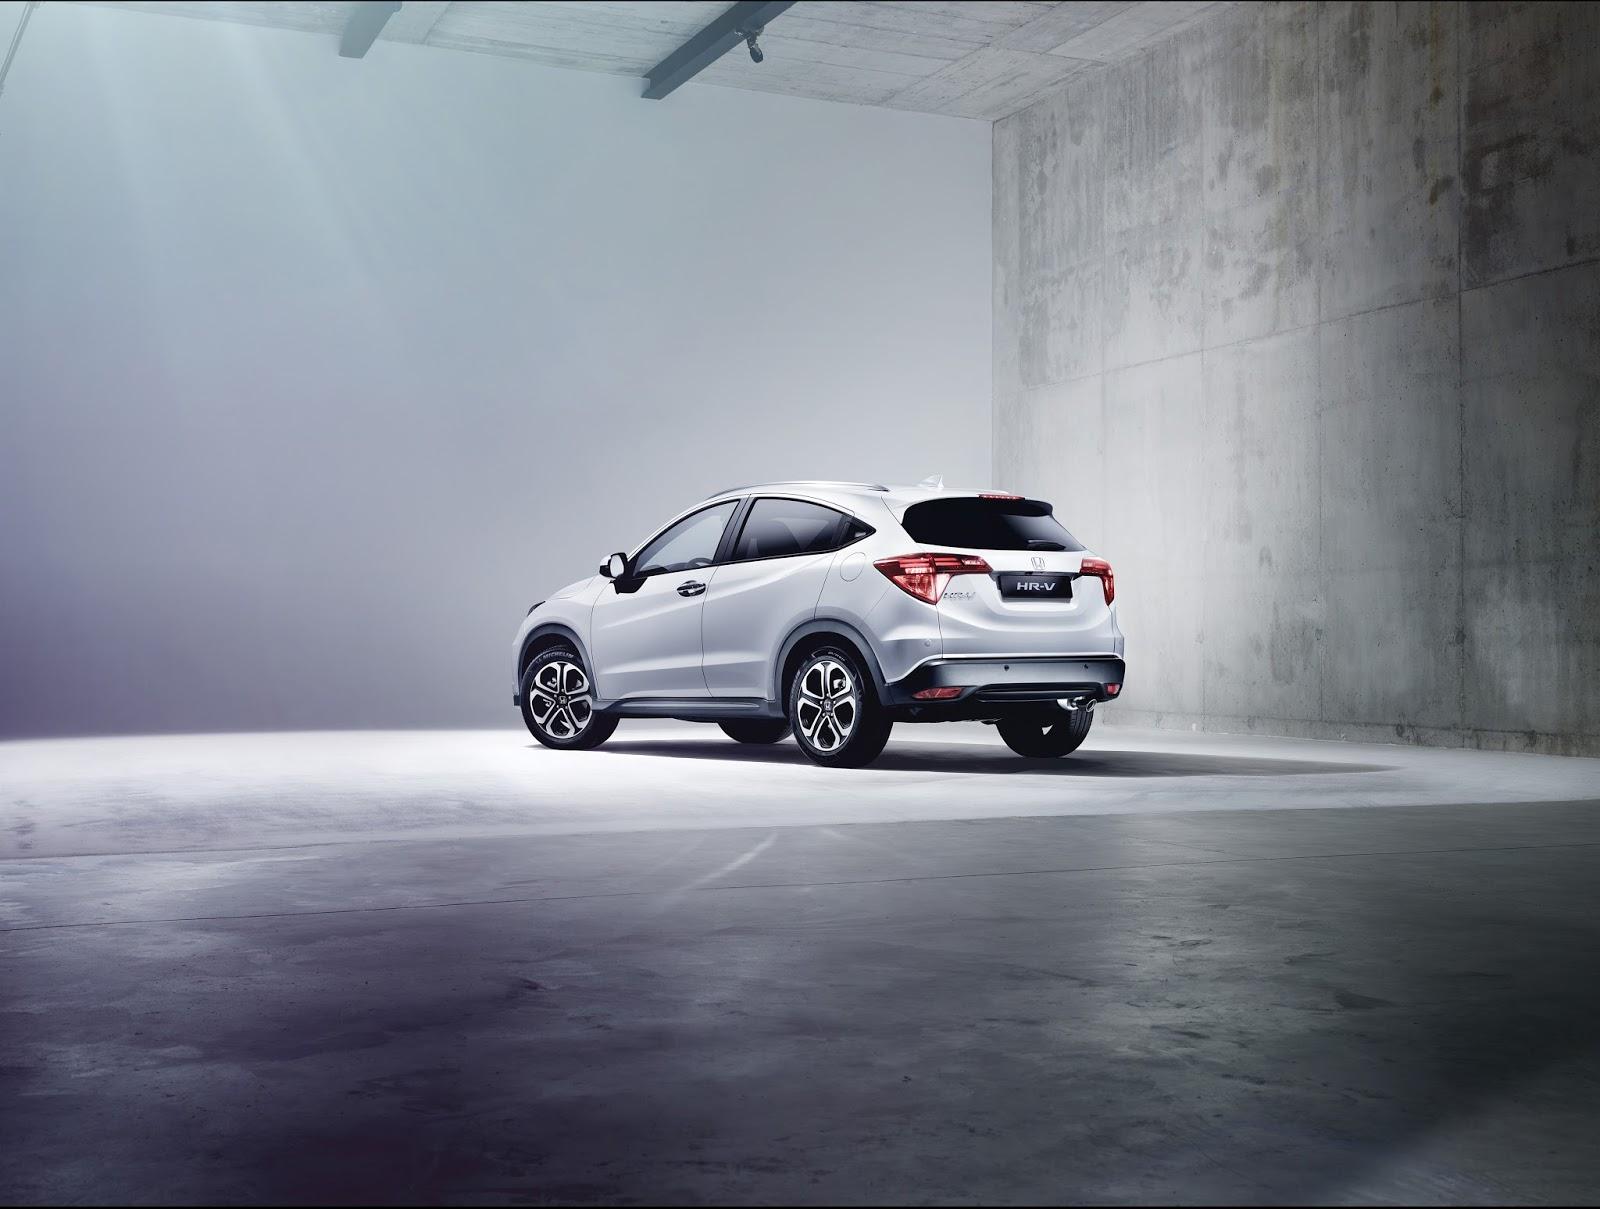 40669 2015 Honda HR V Νέο Honda HR-V : Το πολυμορφικό SUV